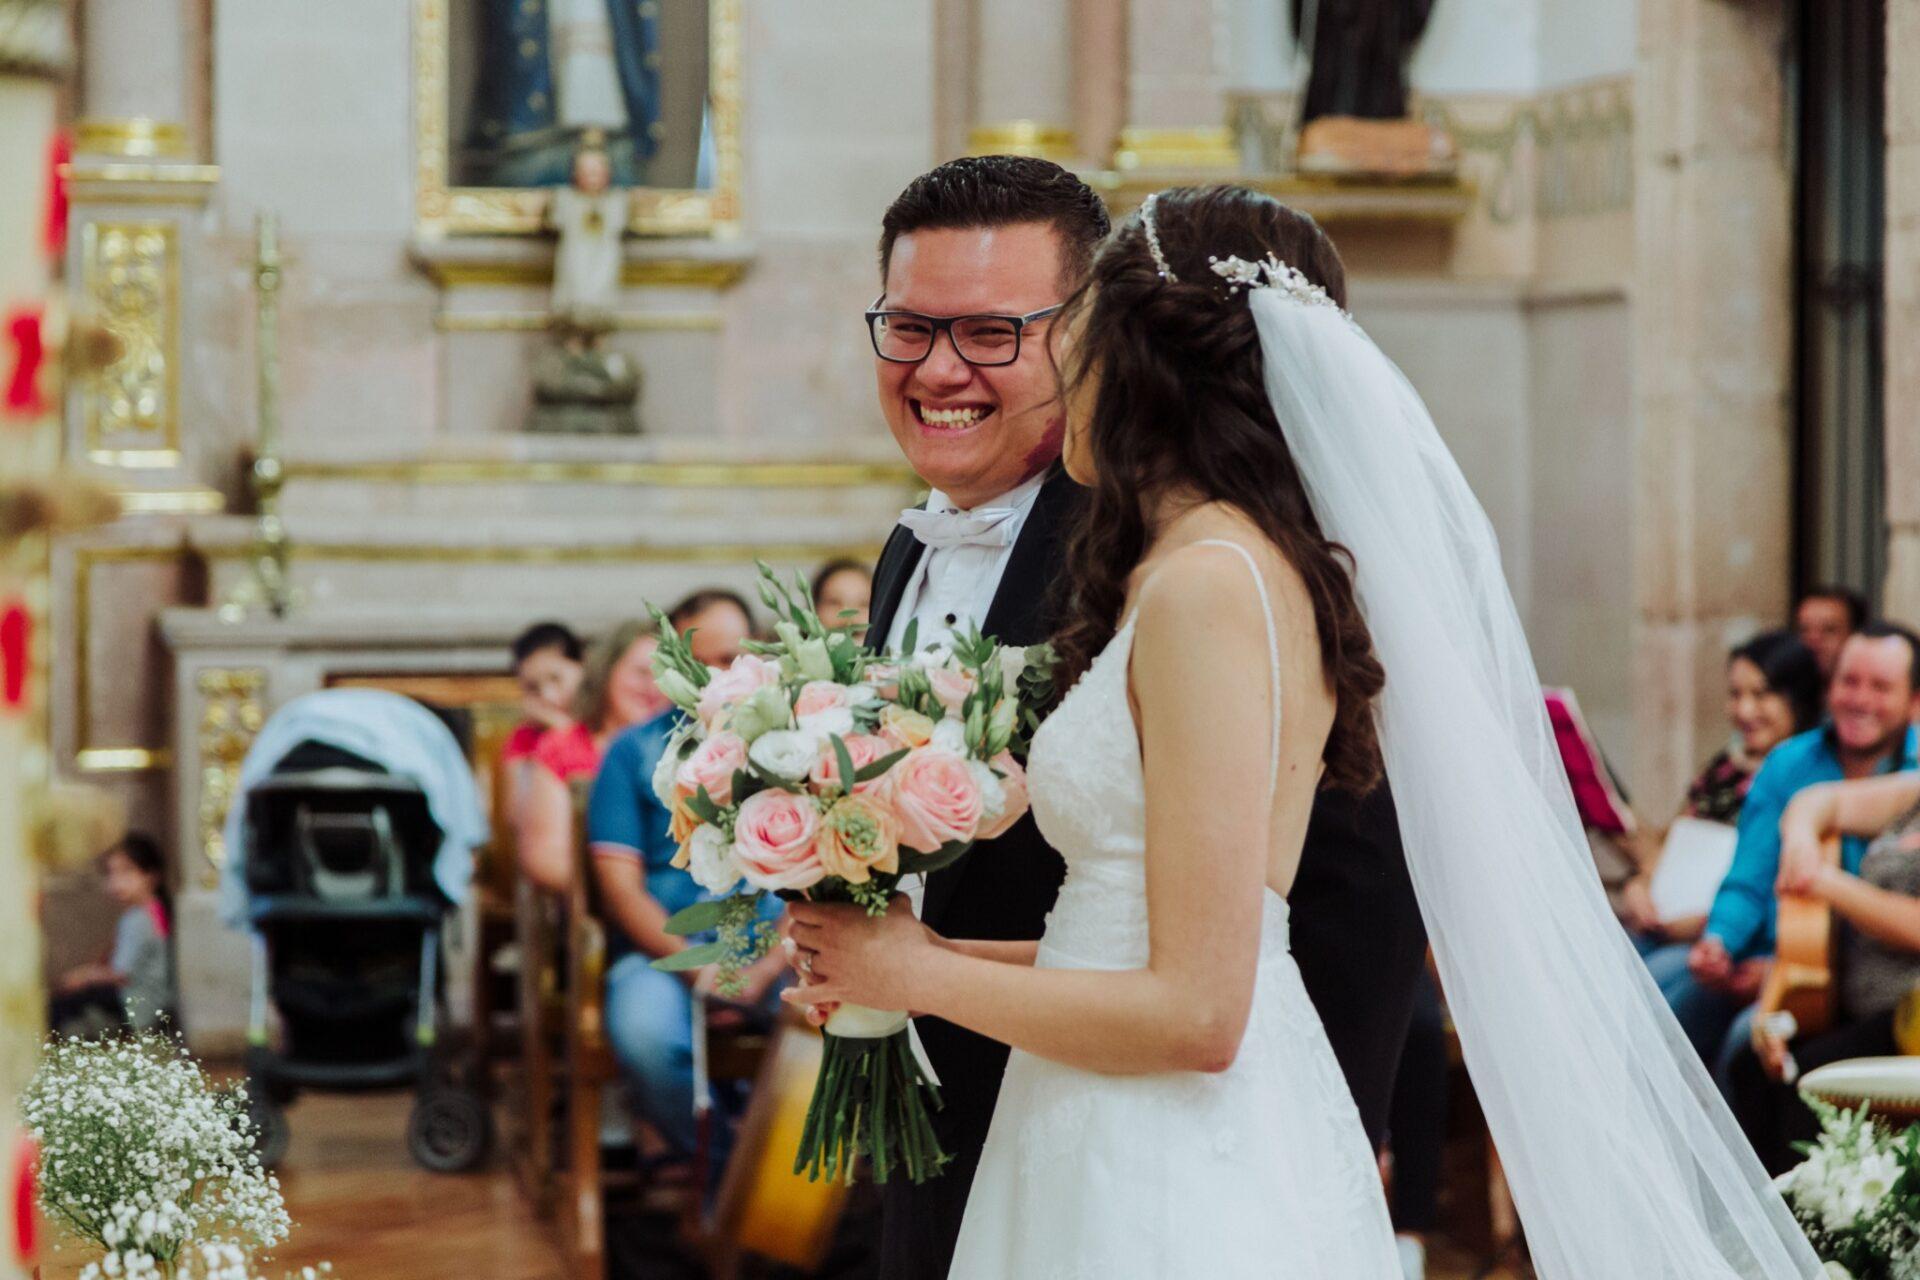 javier_noriega_fotografo_bodas_teul_zacatecas_wedding_photographer11a